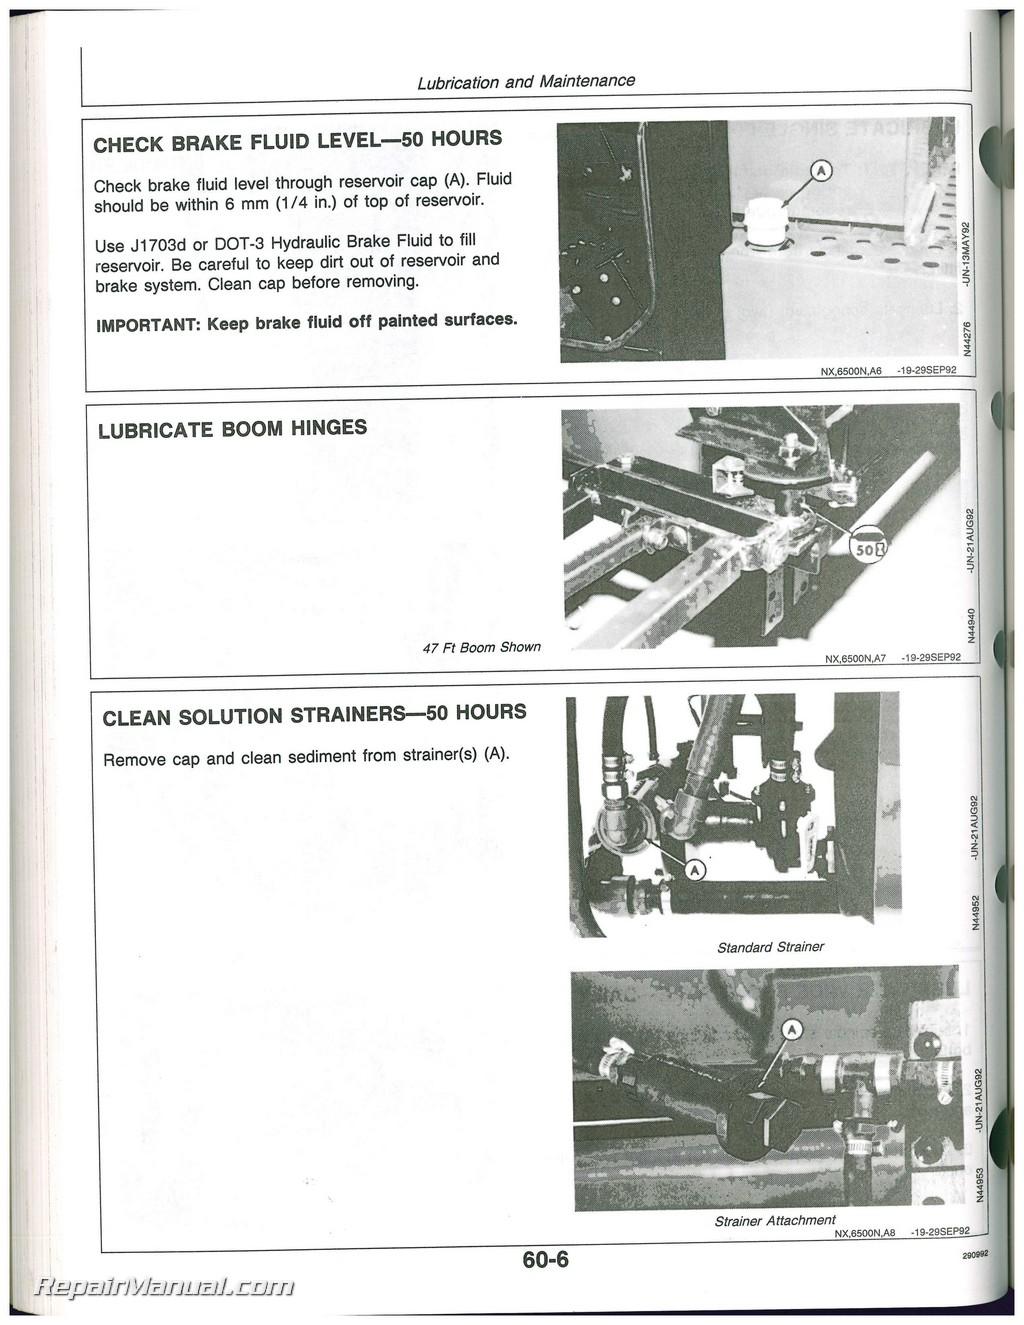 John Deere 6500 Generator Manual 260 Alternator Wiring Diagram Self Propelled Sprayer Operators Rh Repairmanual Com 6200 Onan Electric Start